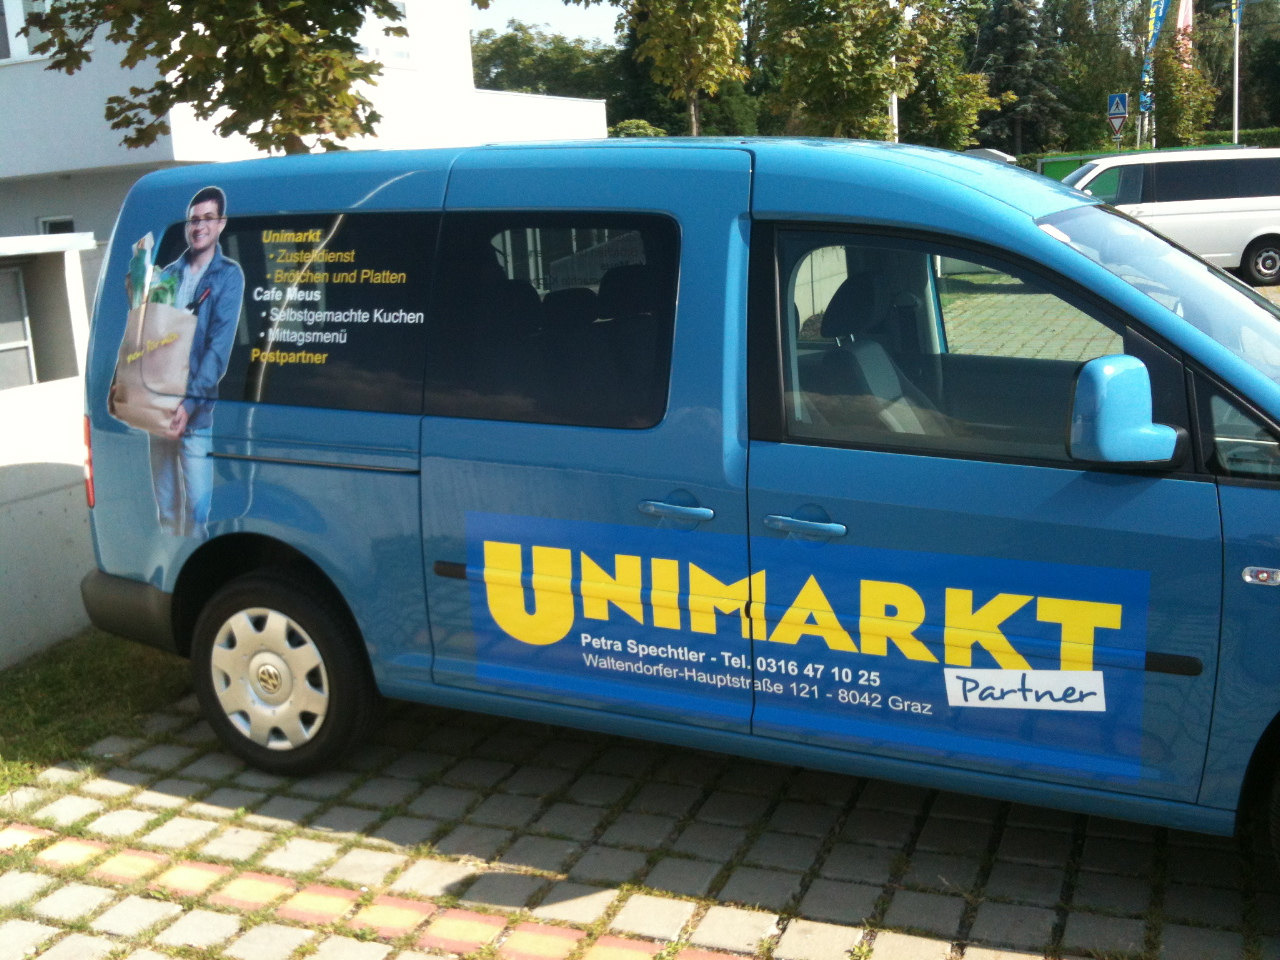 Unimarkt3.jpg